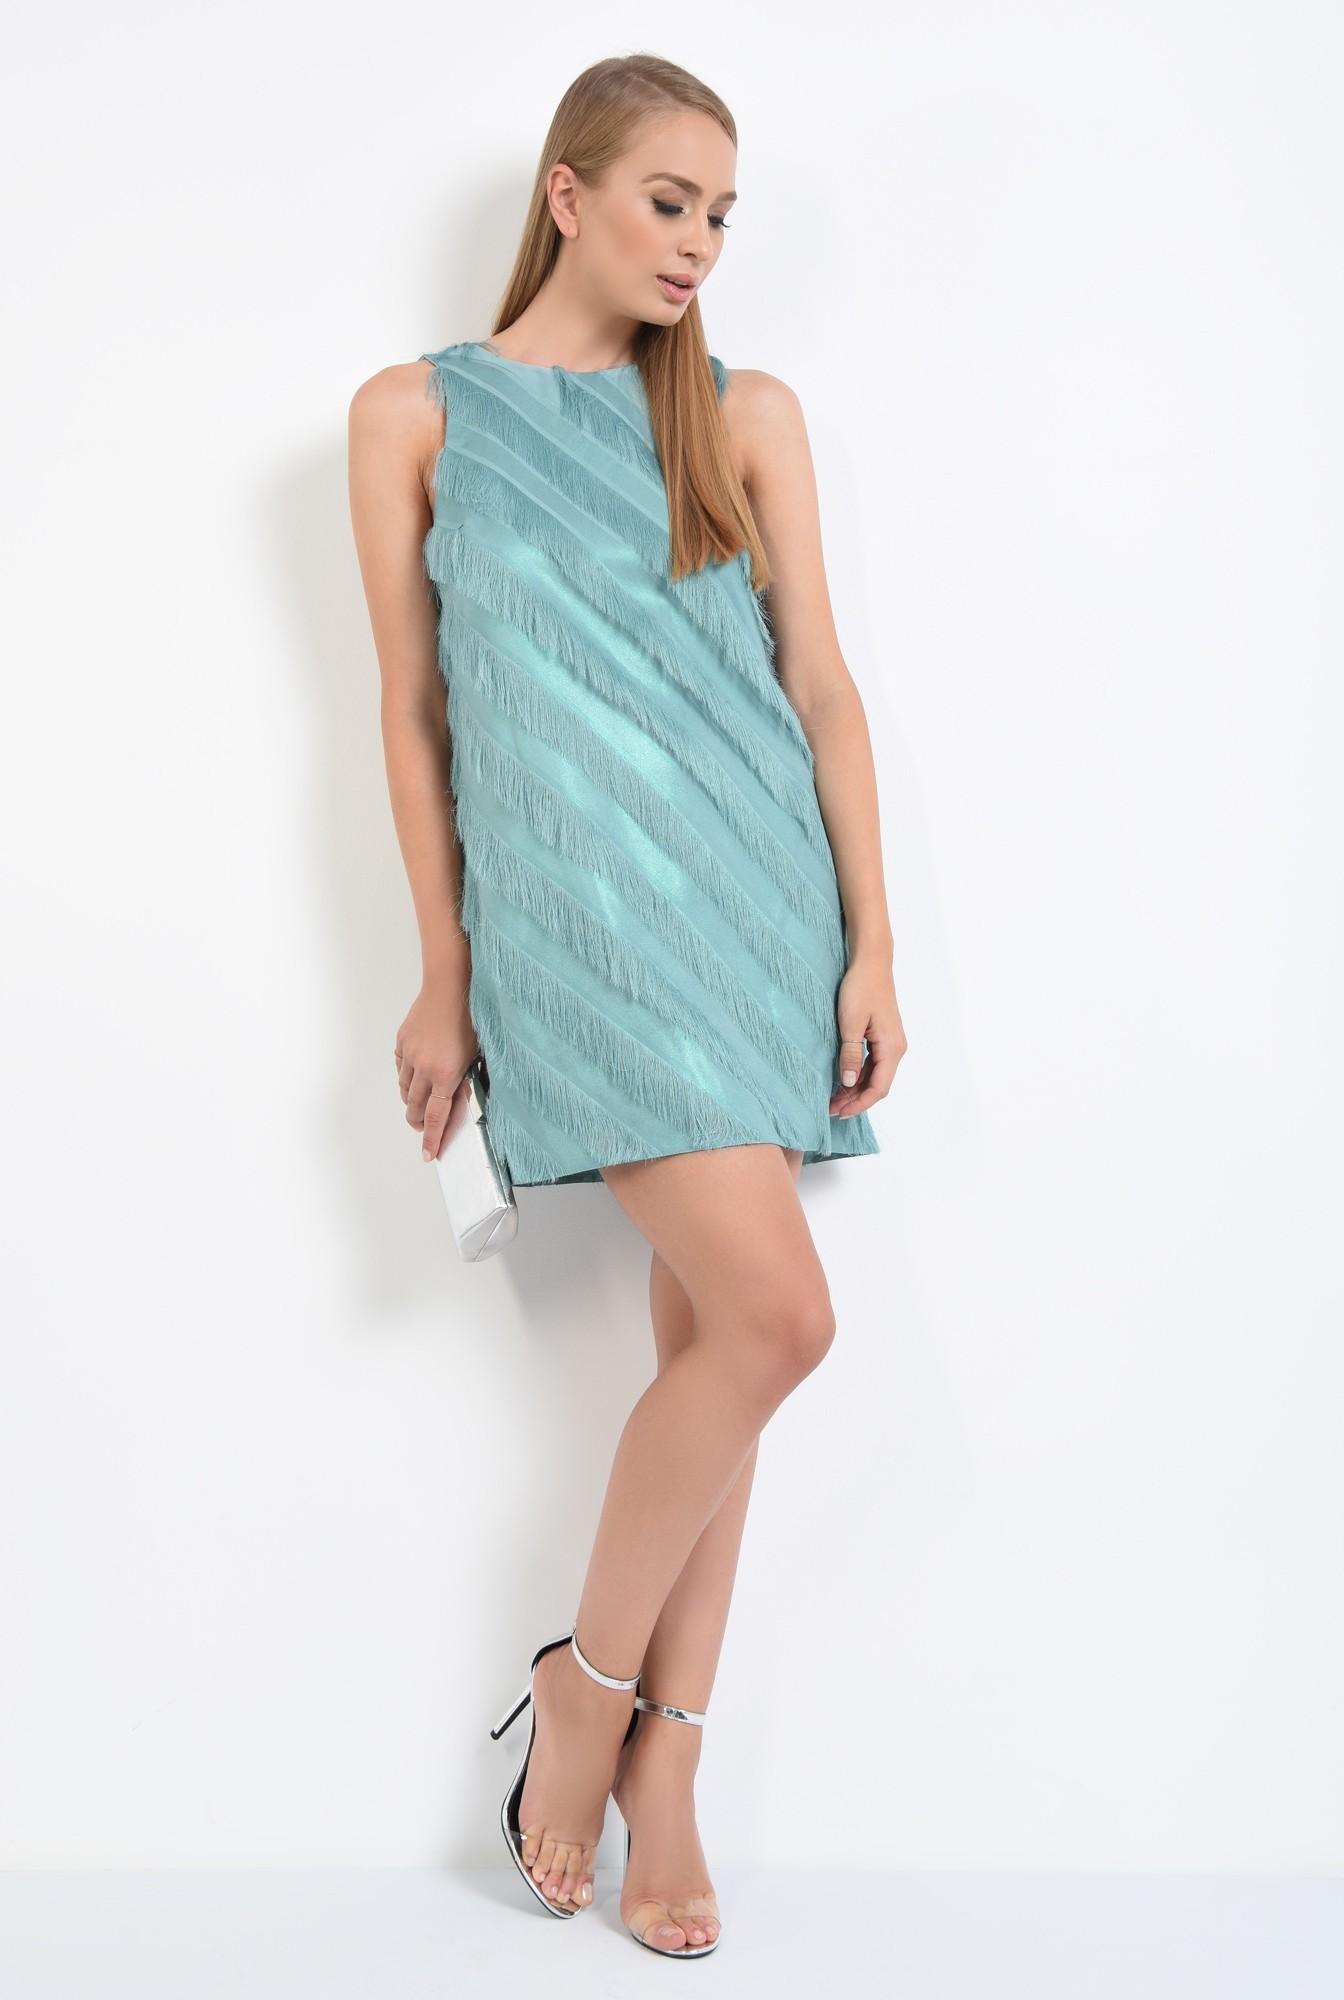 3 - rochie de seara, turcoaz, franjuri